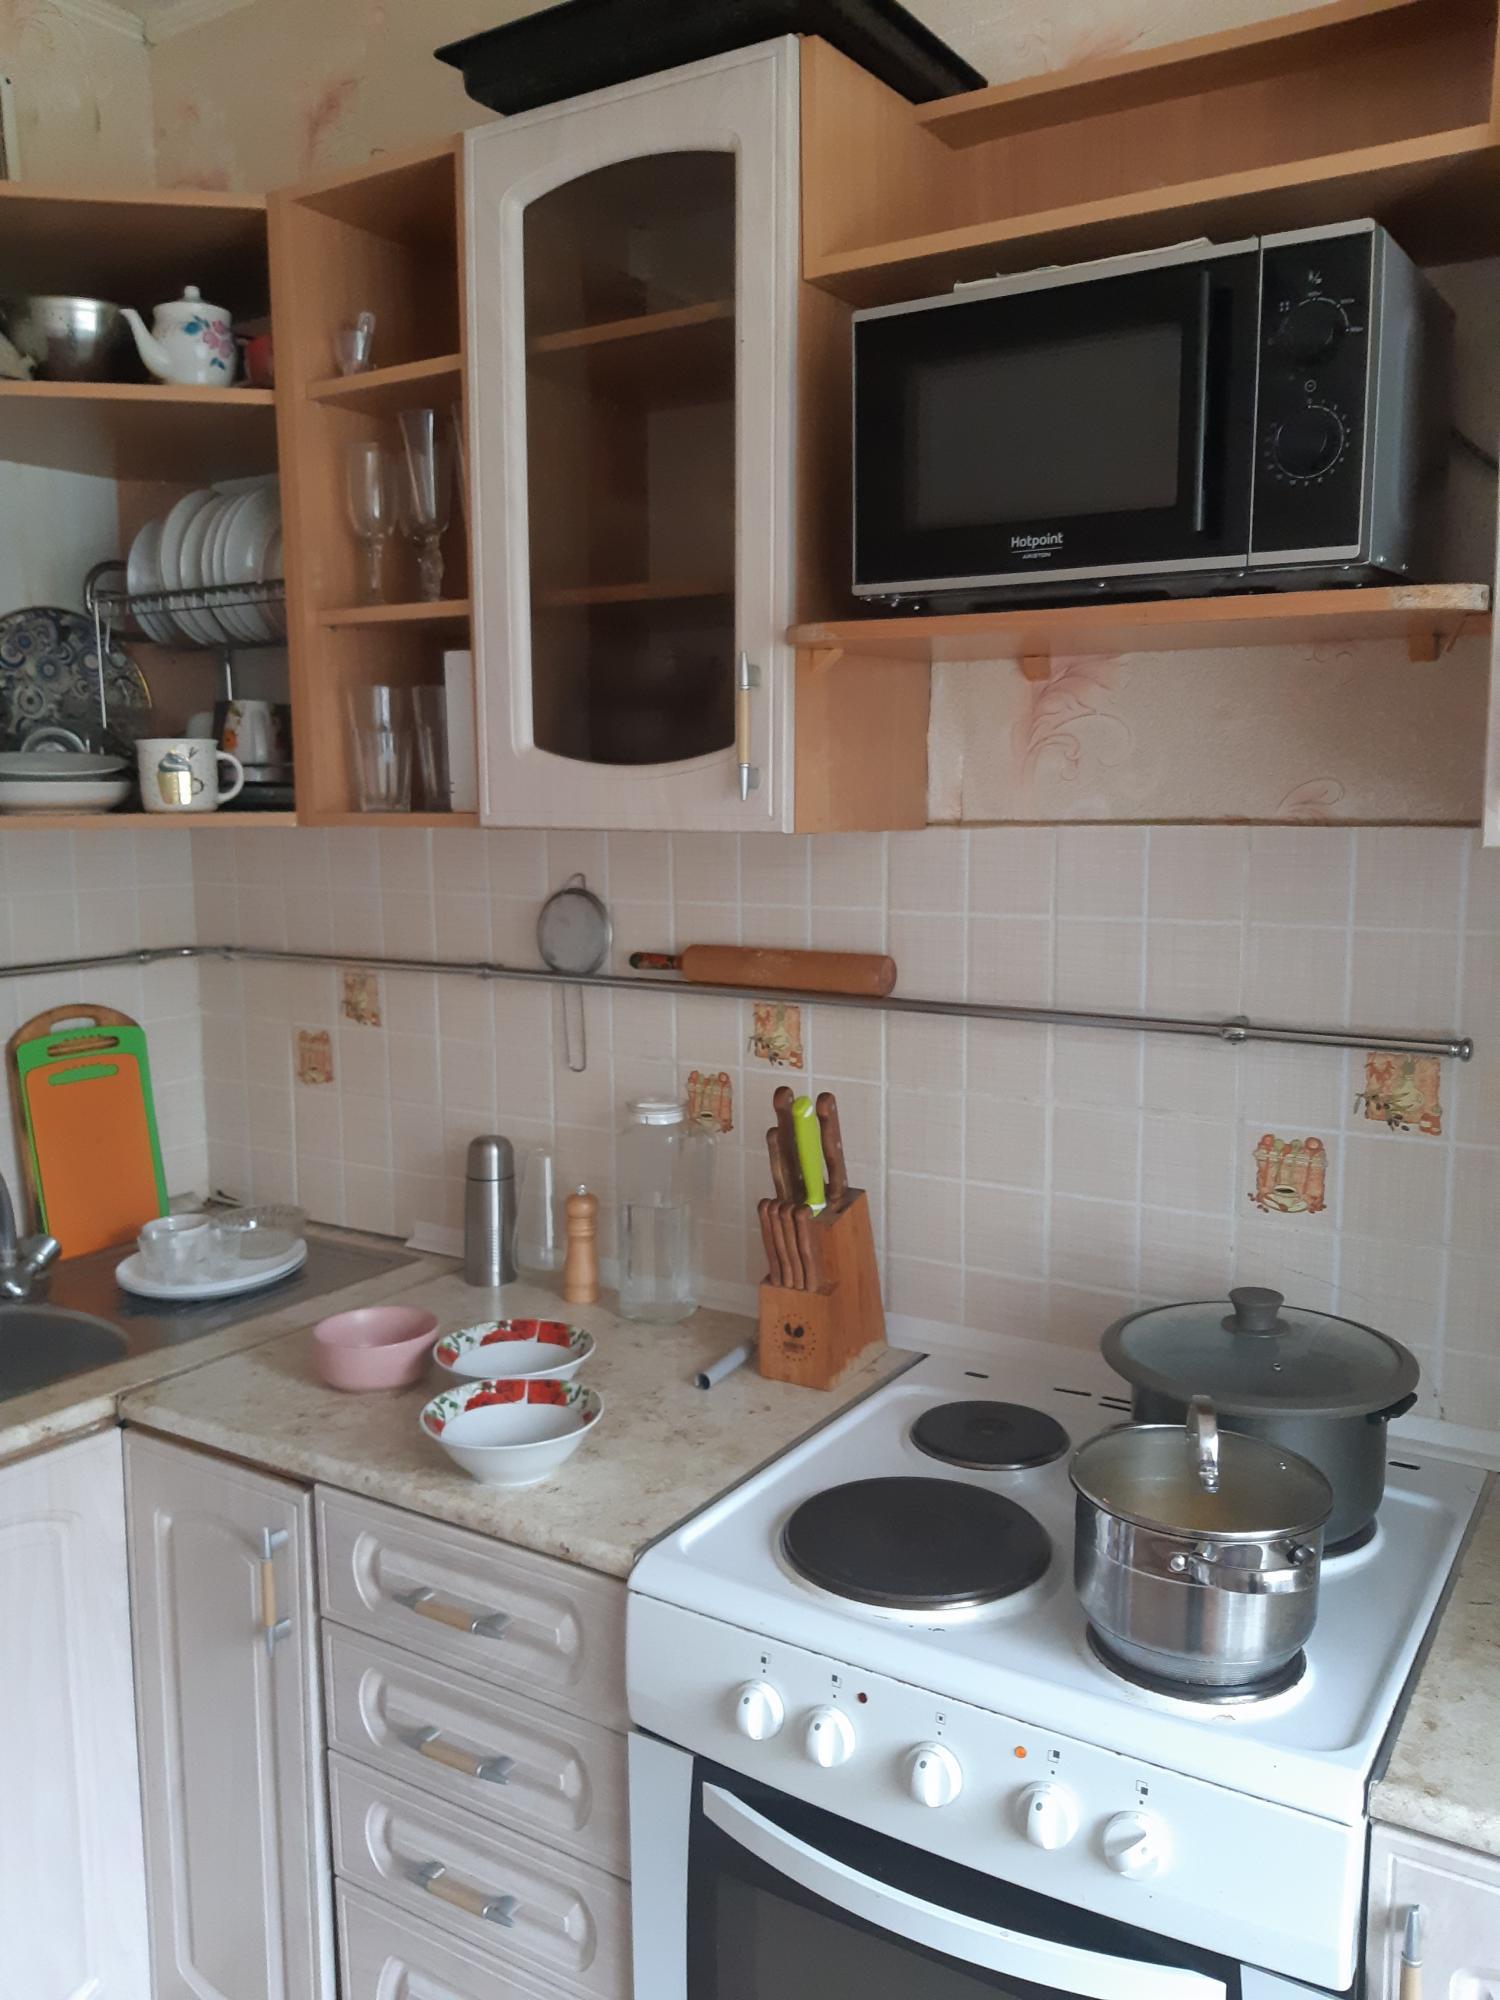 2к квартира Станочная улица, 7 | 14000 | аренда в Красноярске фото 7